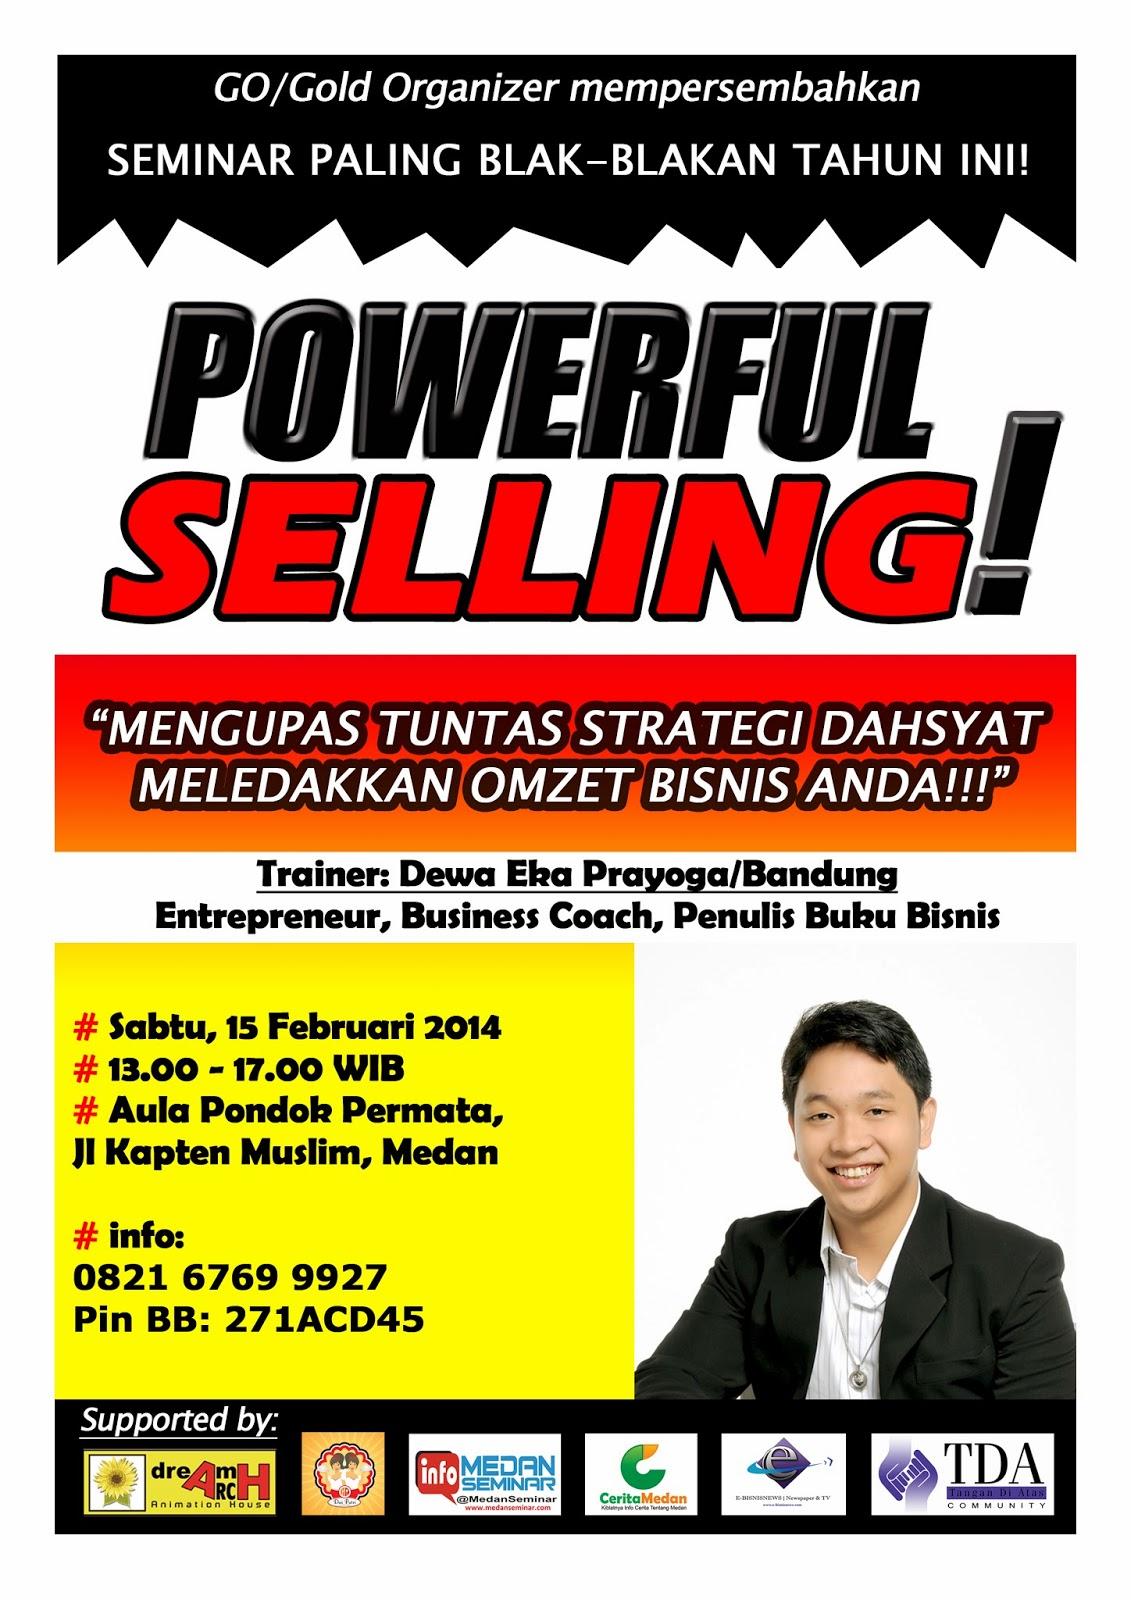 Seminar Medan : Powerfull Selling